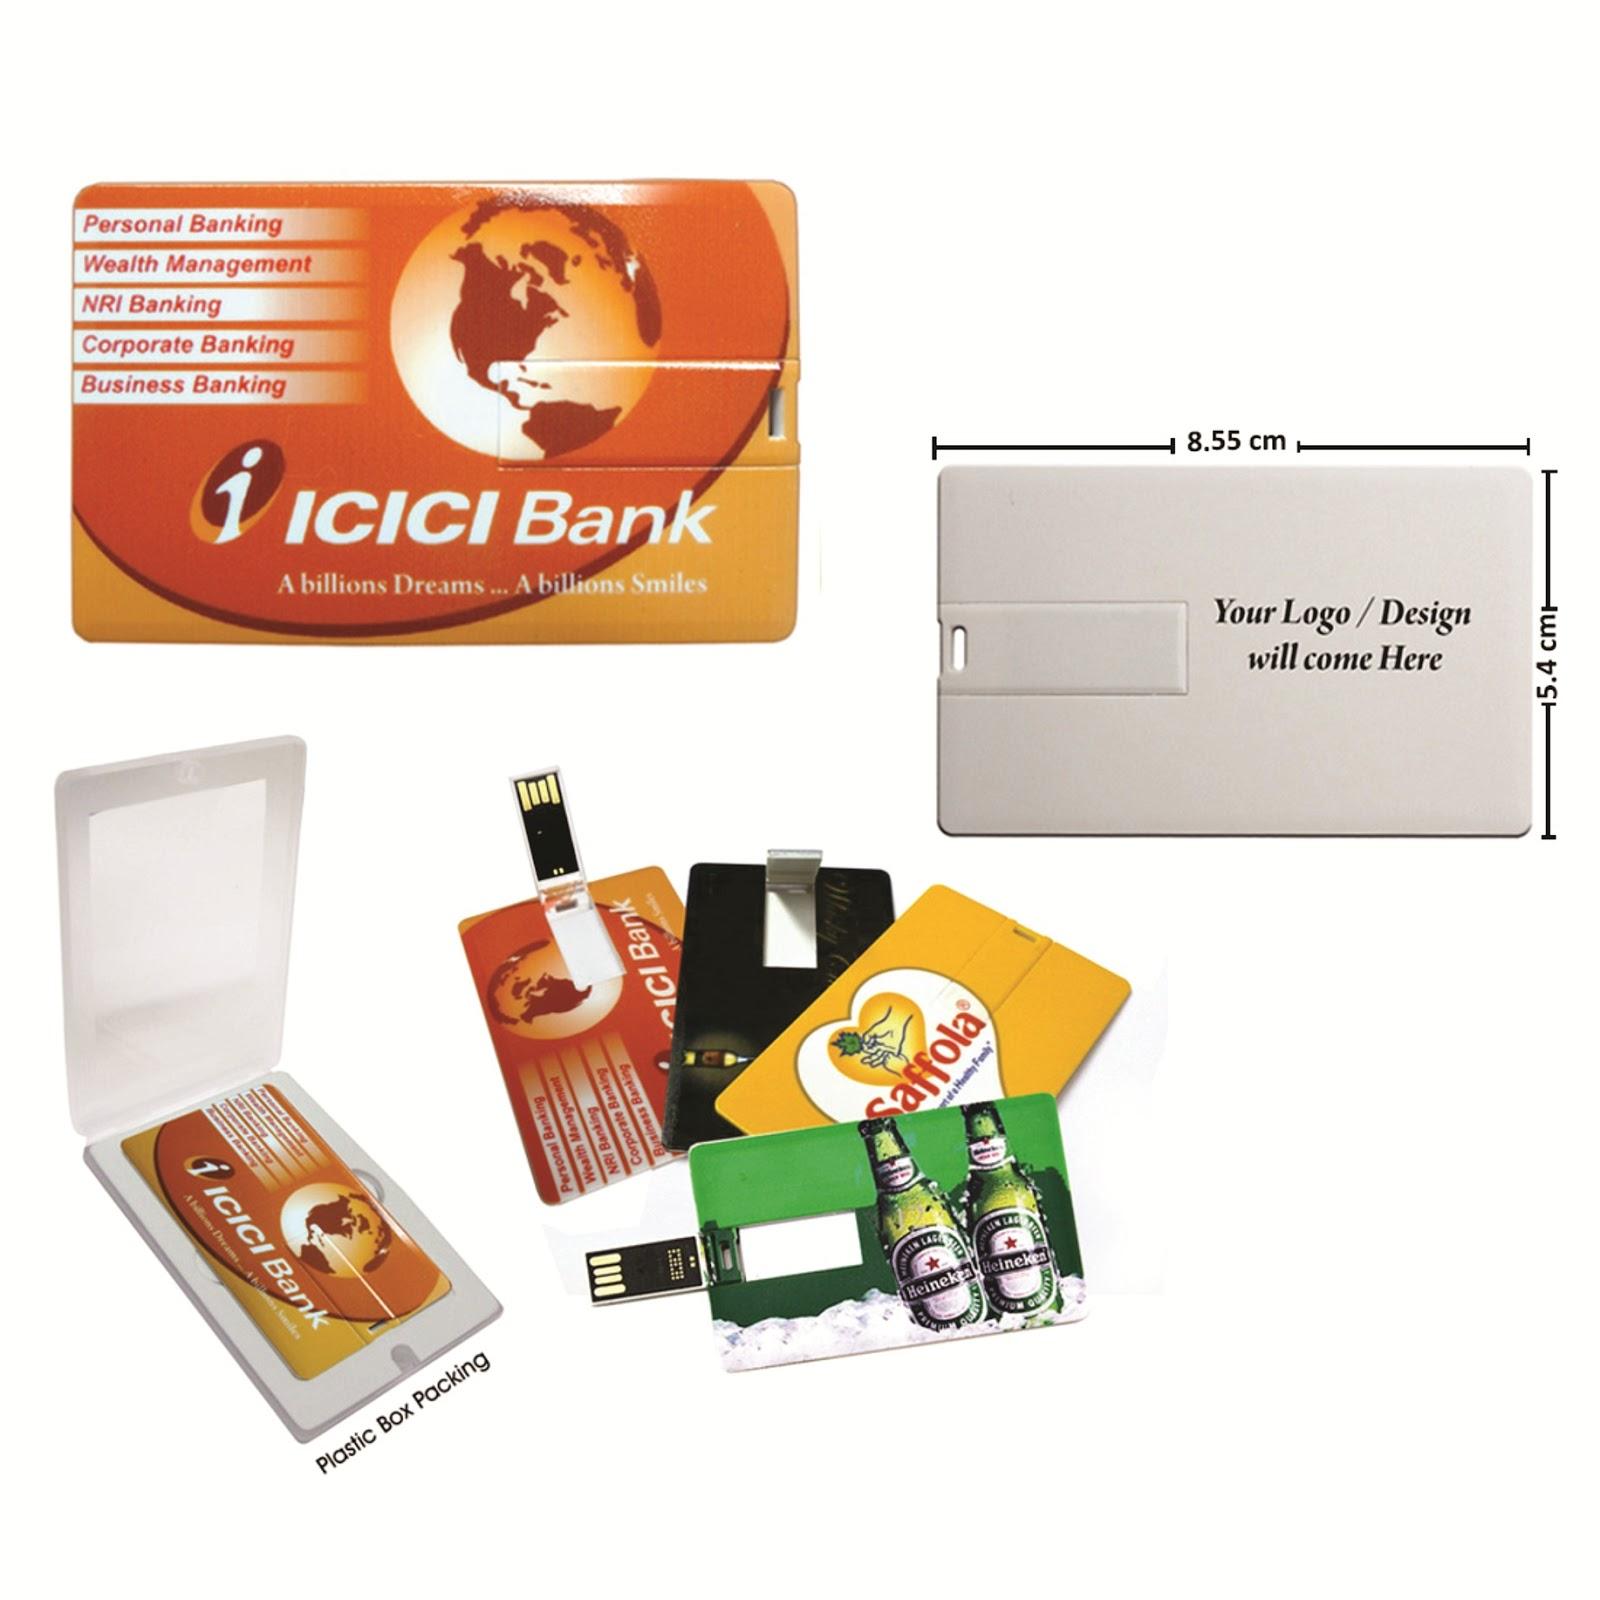 Pen drive manufacturers credit card pen drives manufacturers in mumbai credit card pen drives manufacturers in mumbai reheart Gallery